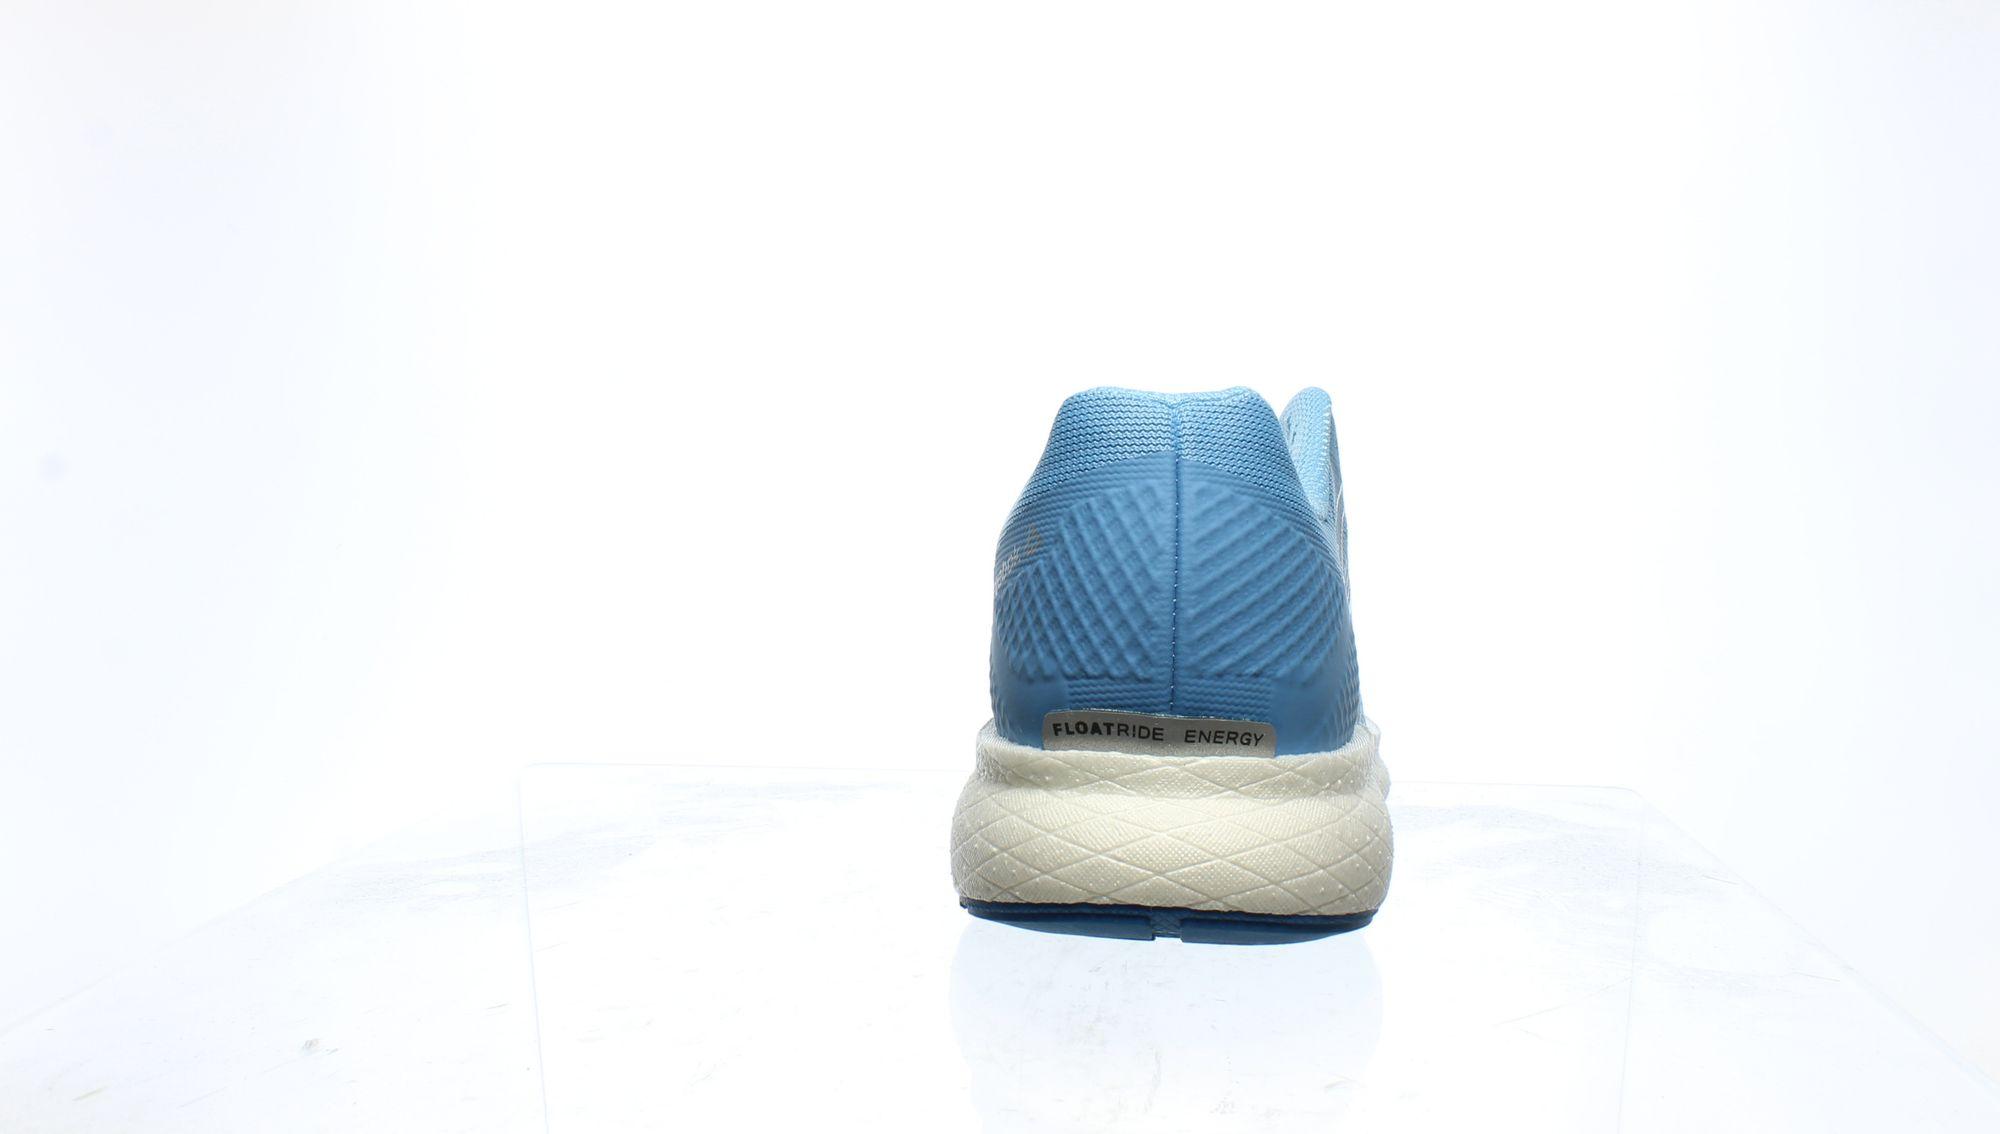 Reebok-Womens-Forever-Floatride-Energy-Running-Shoes thumbnail 16